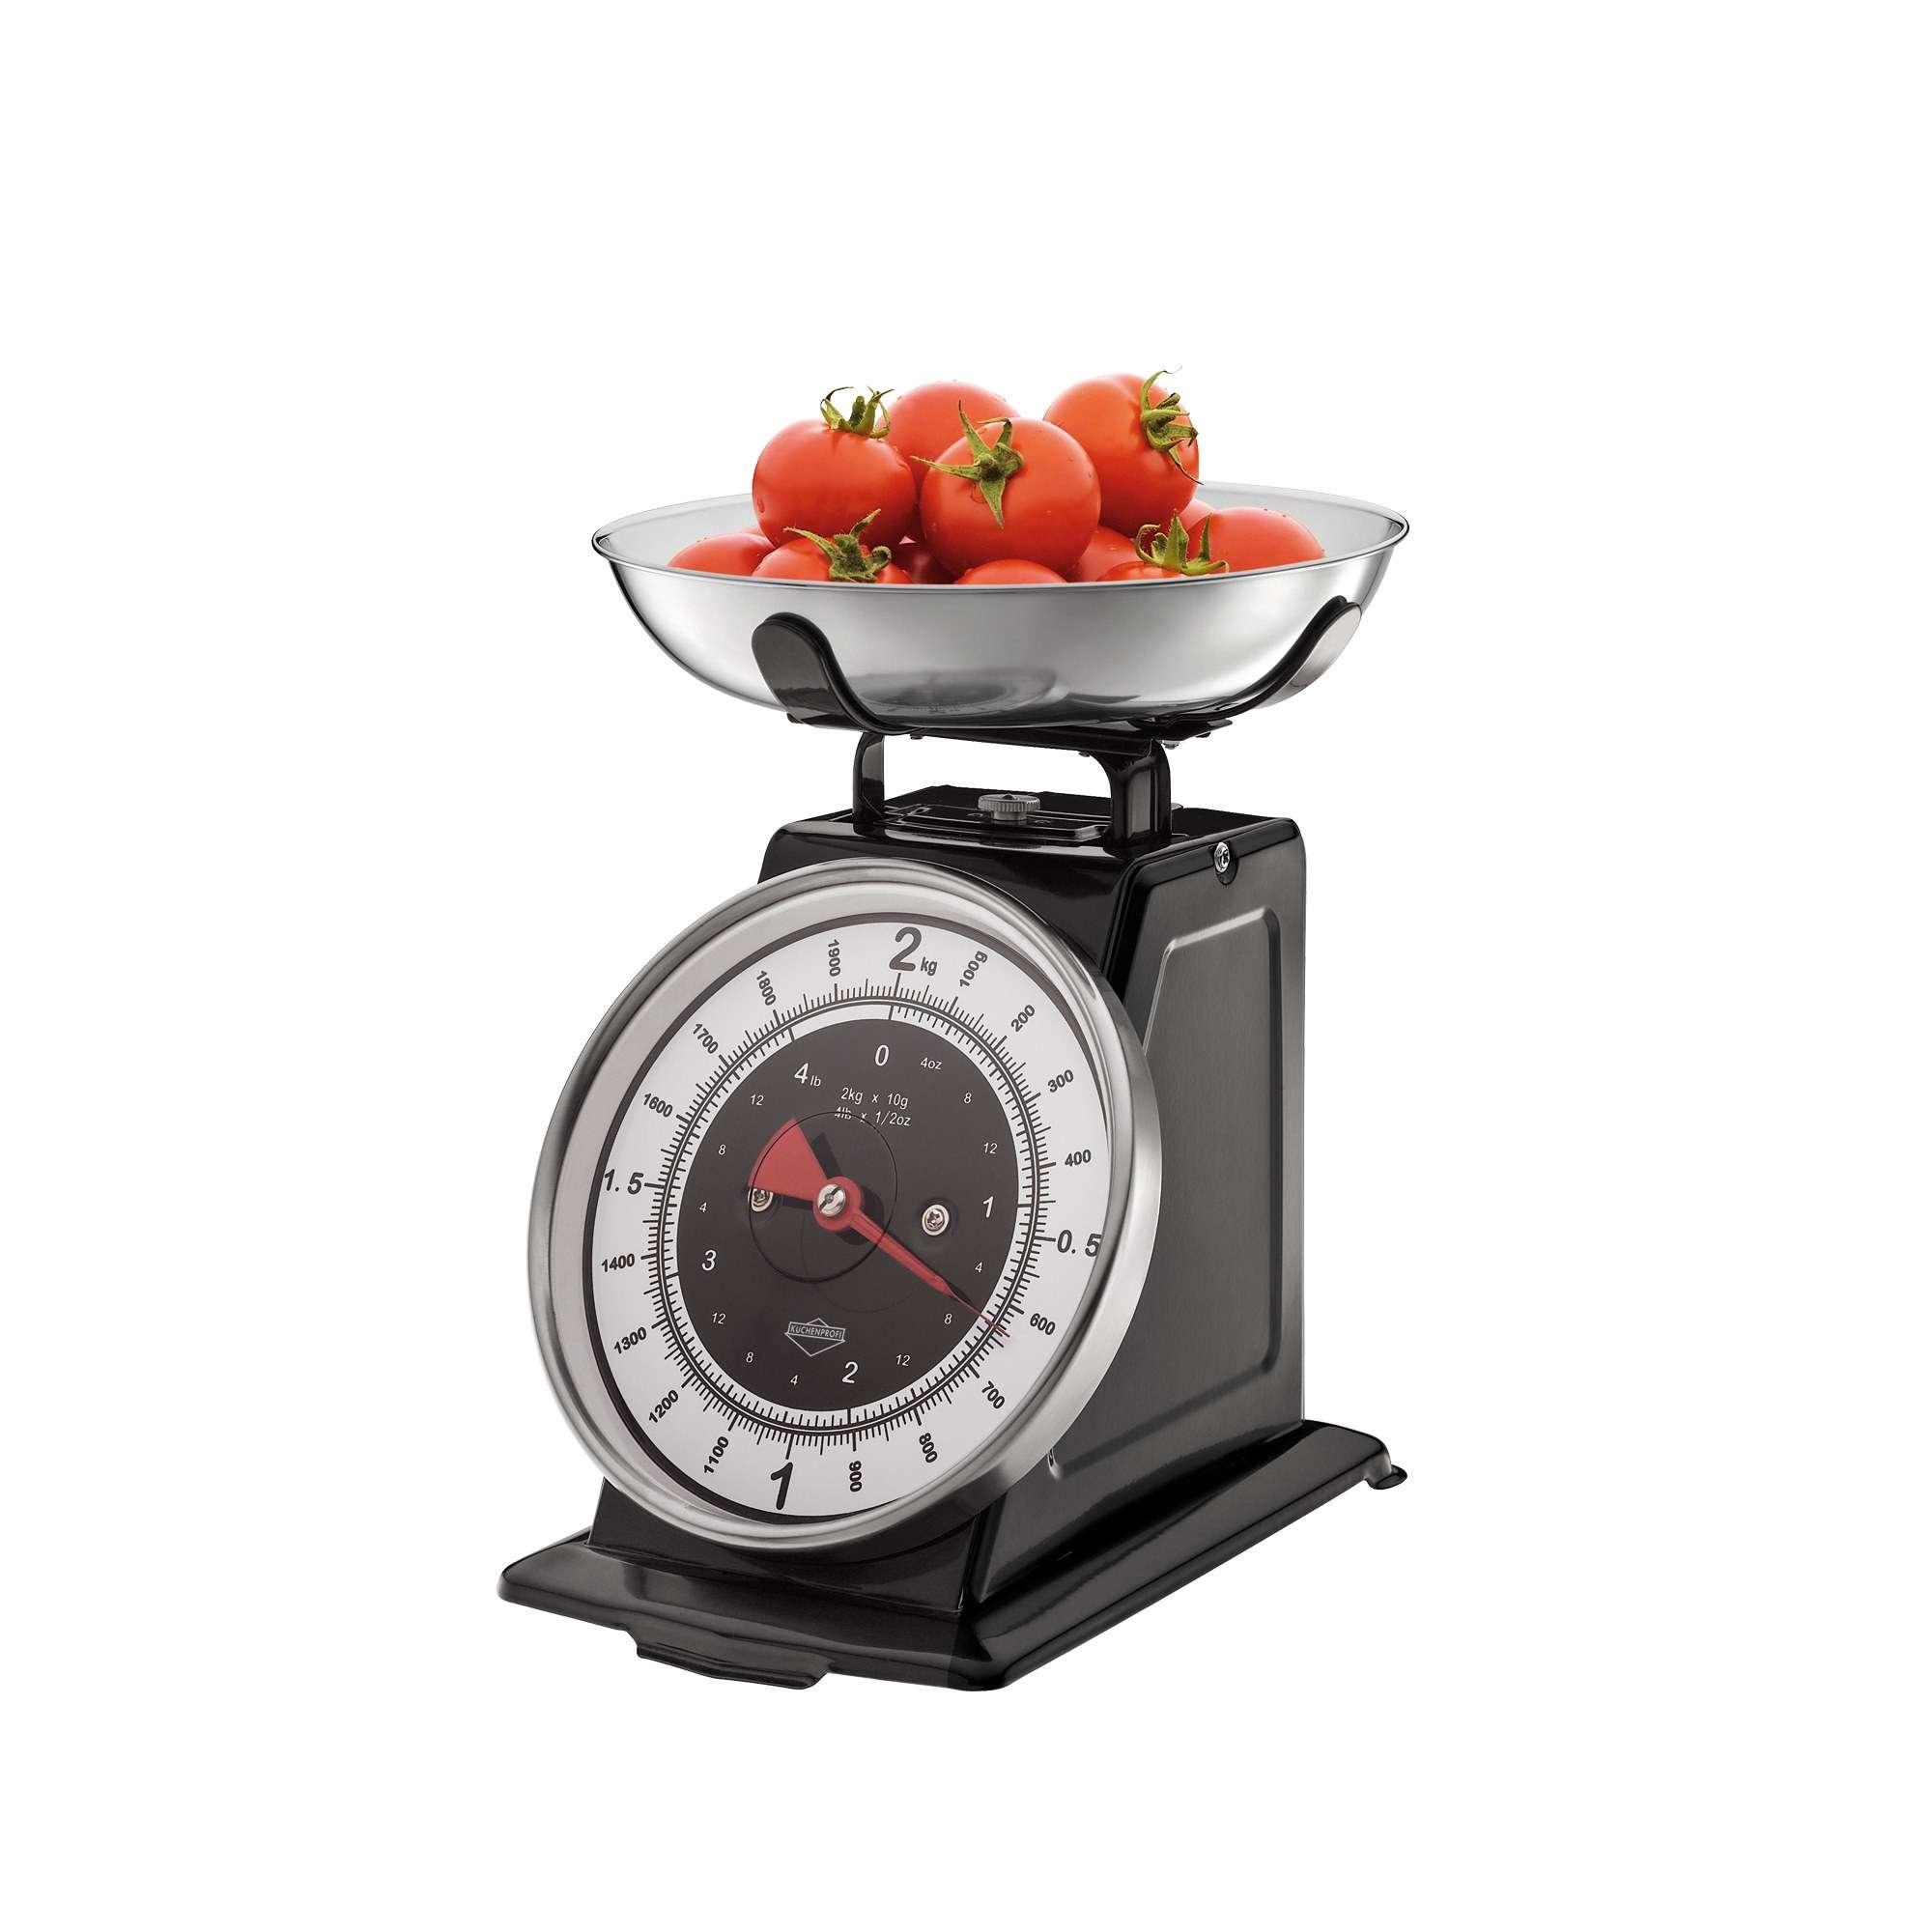 Kuchenprofi Nostalgie Kitchen Scales Black Scales Measuring Cups